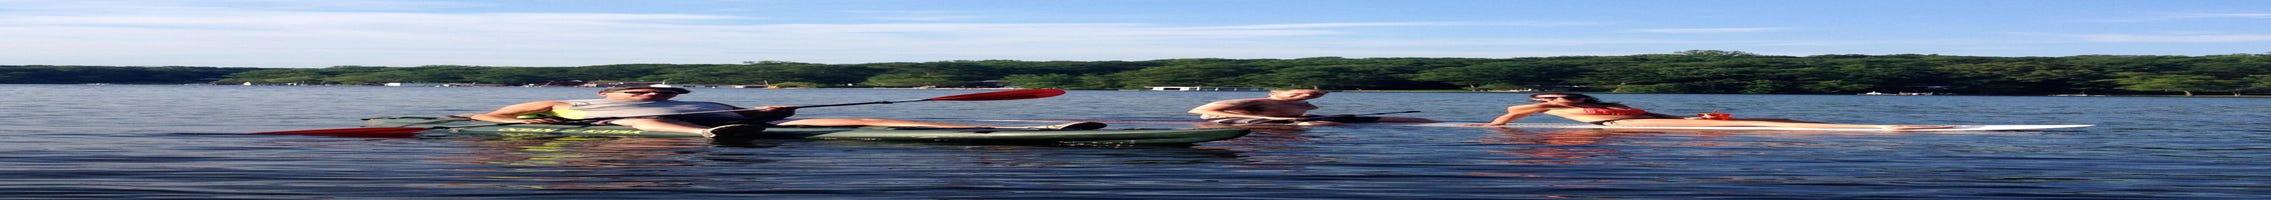 Water workouts, fitness on Lake Hopatcong